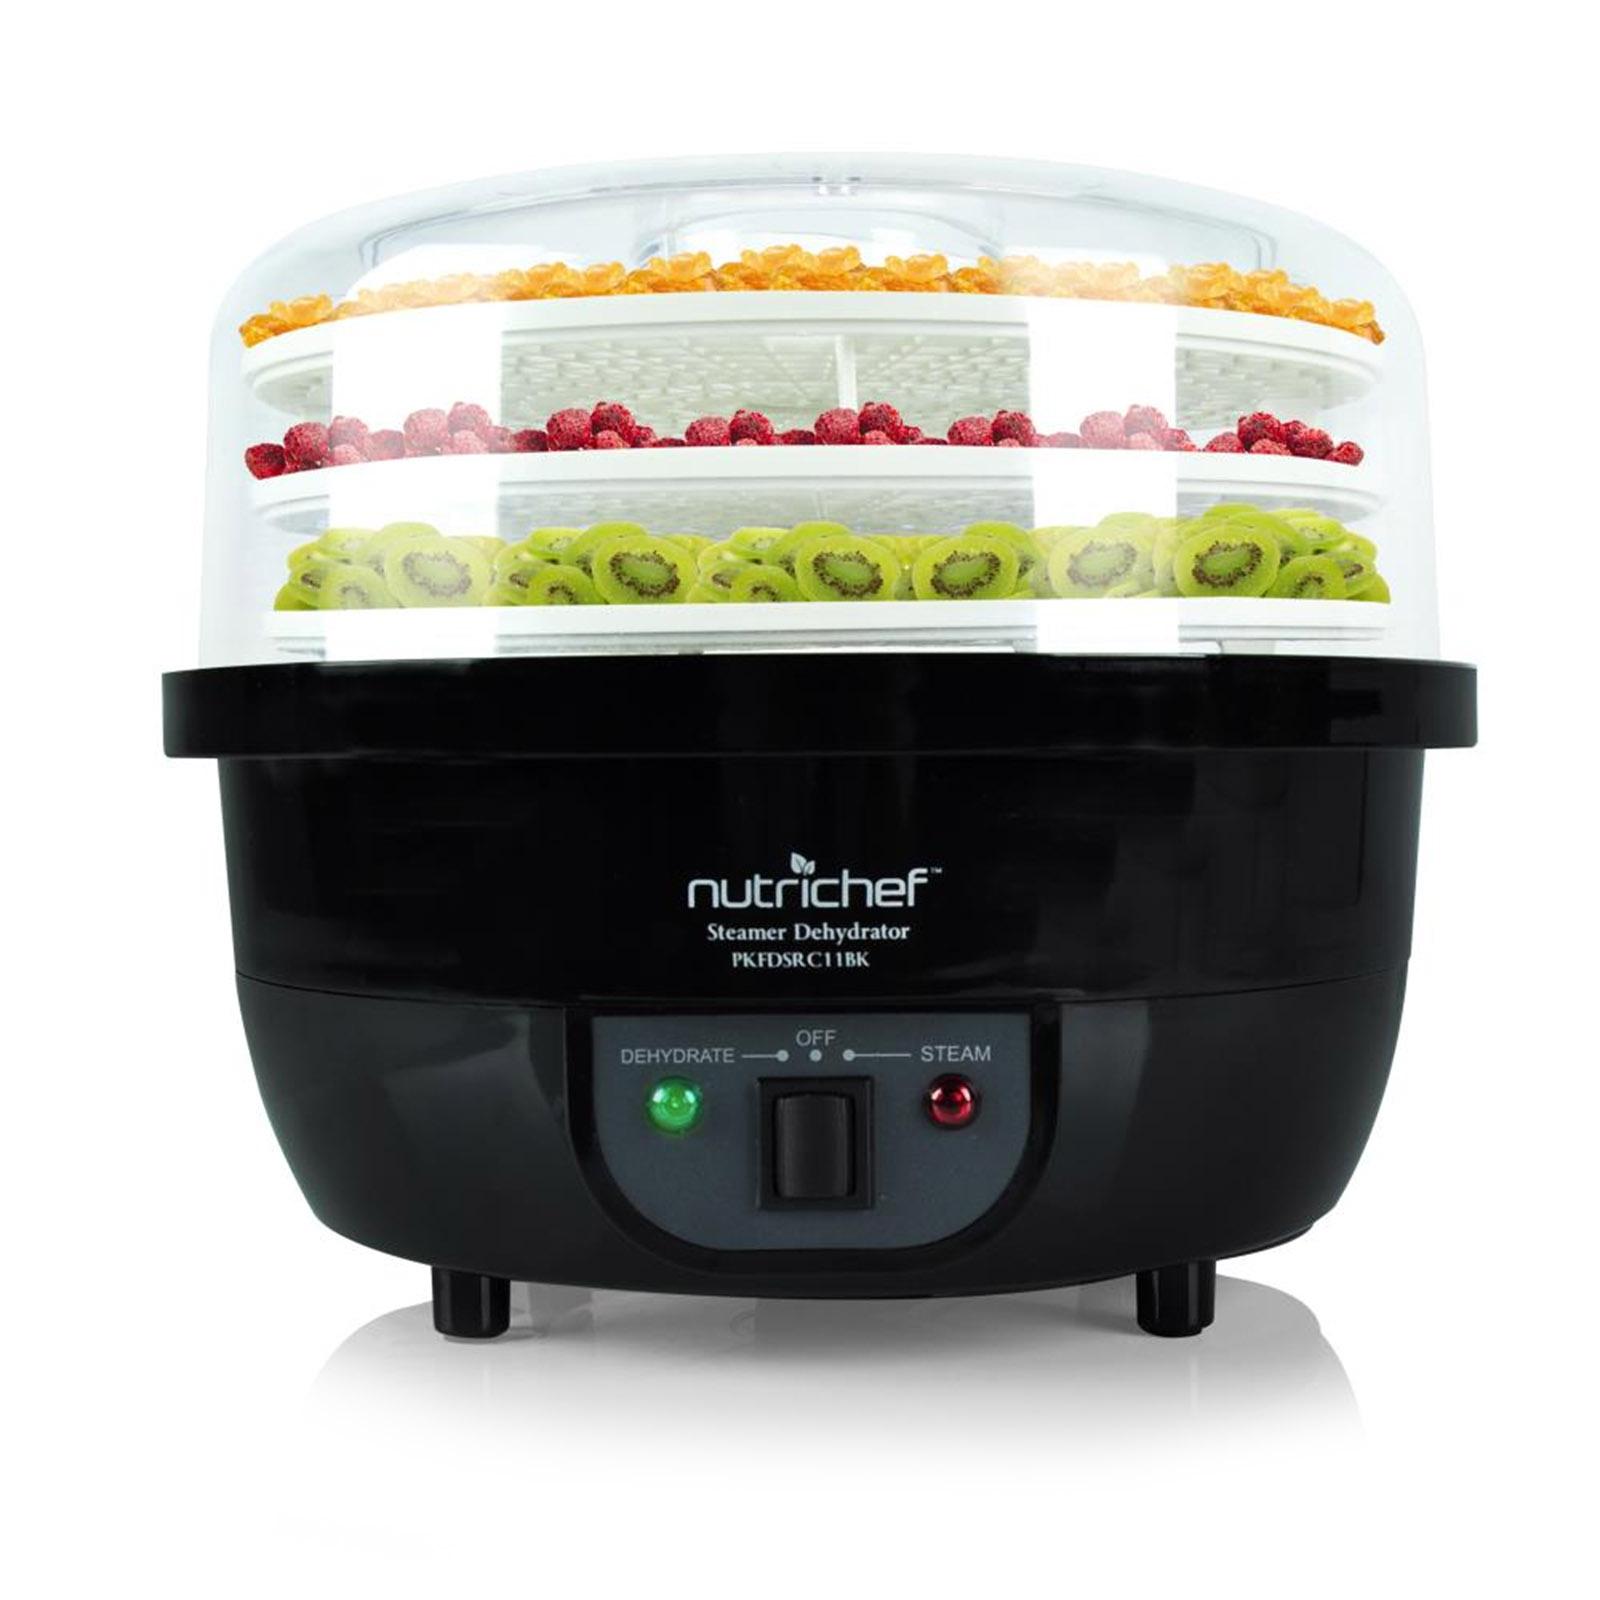 NutriChef 3-in-1 Dehydrator & Steamer Food Cooker - Black